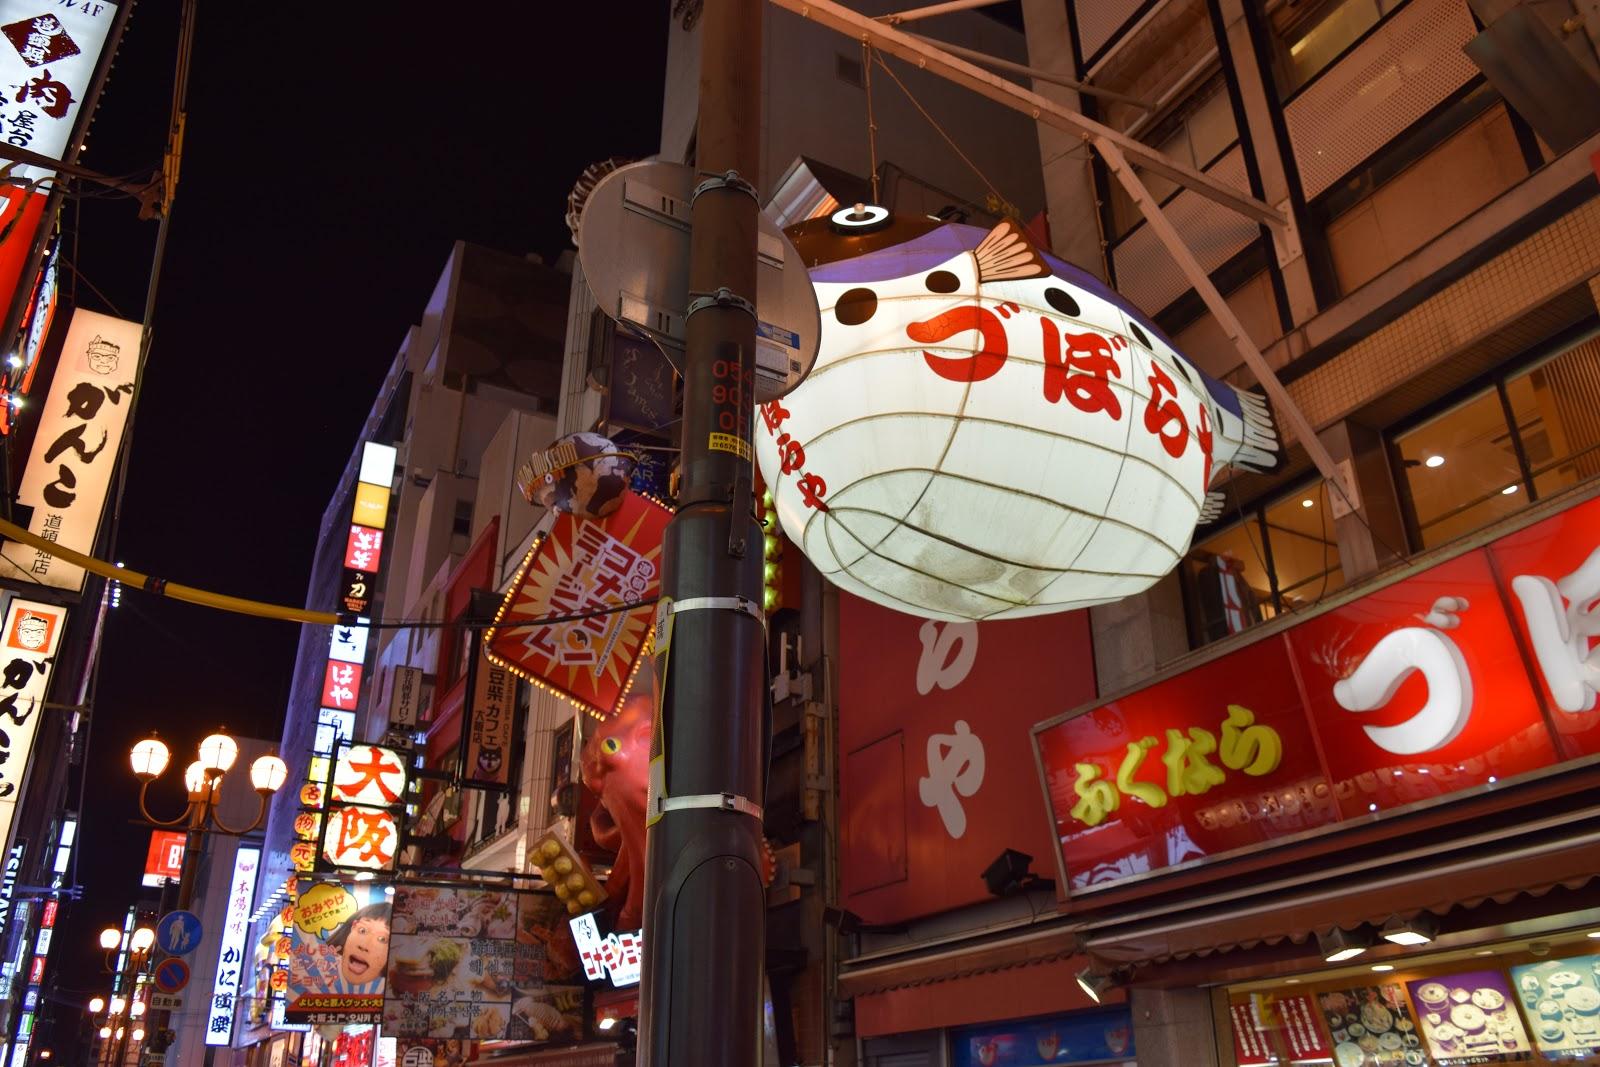 Neon signs and giant puffer fish in Dotombori, Osaka